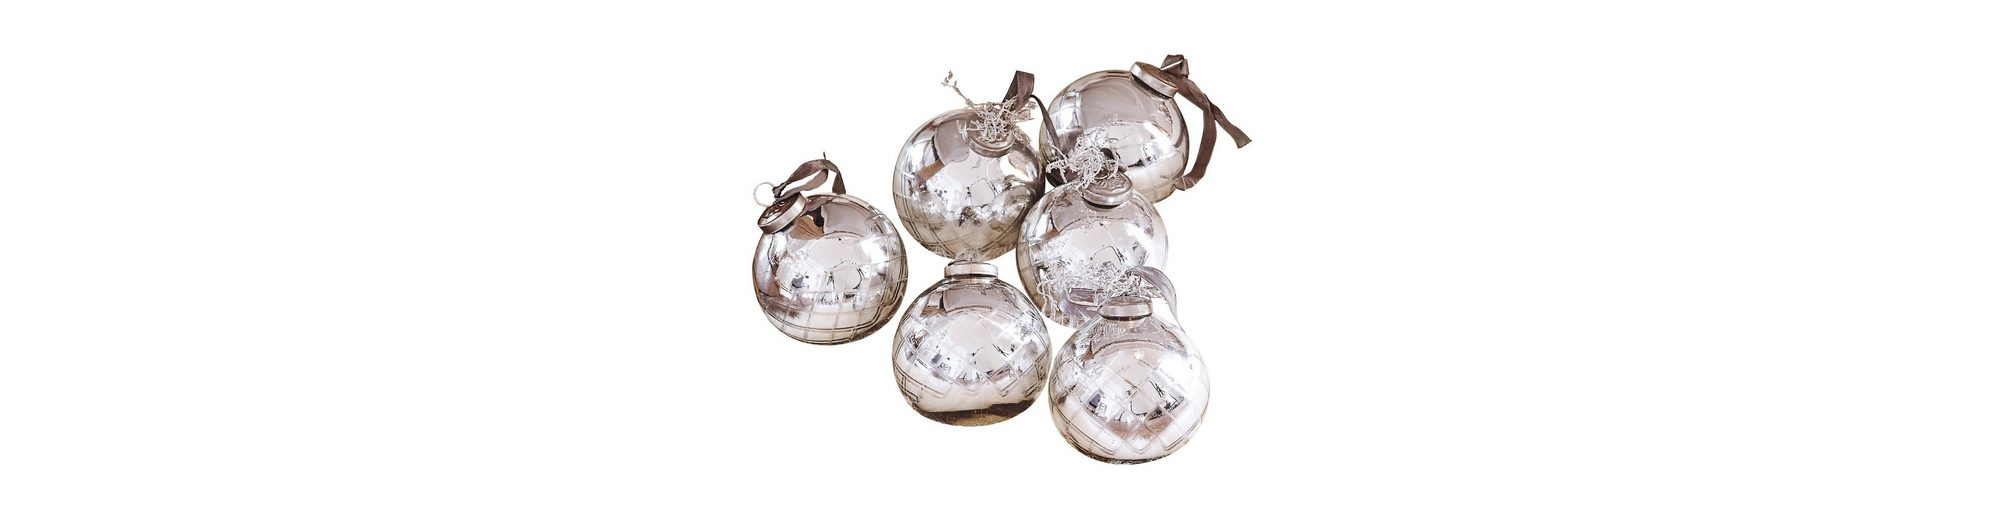 Loberon Weihnachtsschmuck 6er Packung »Gina«